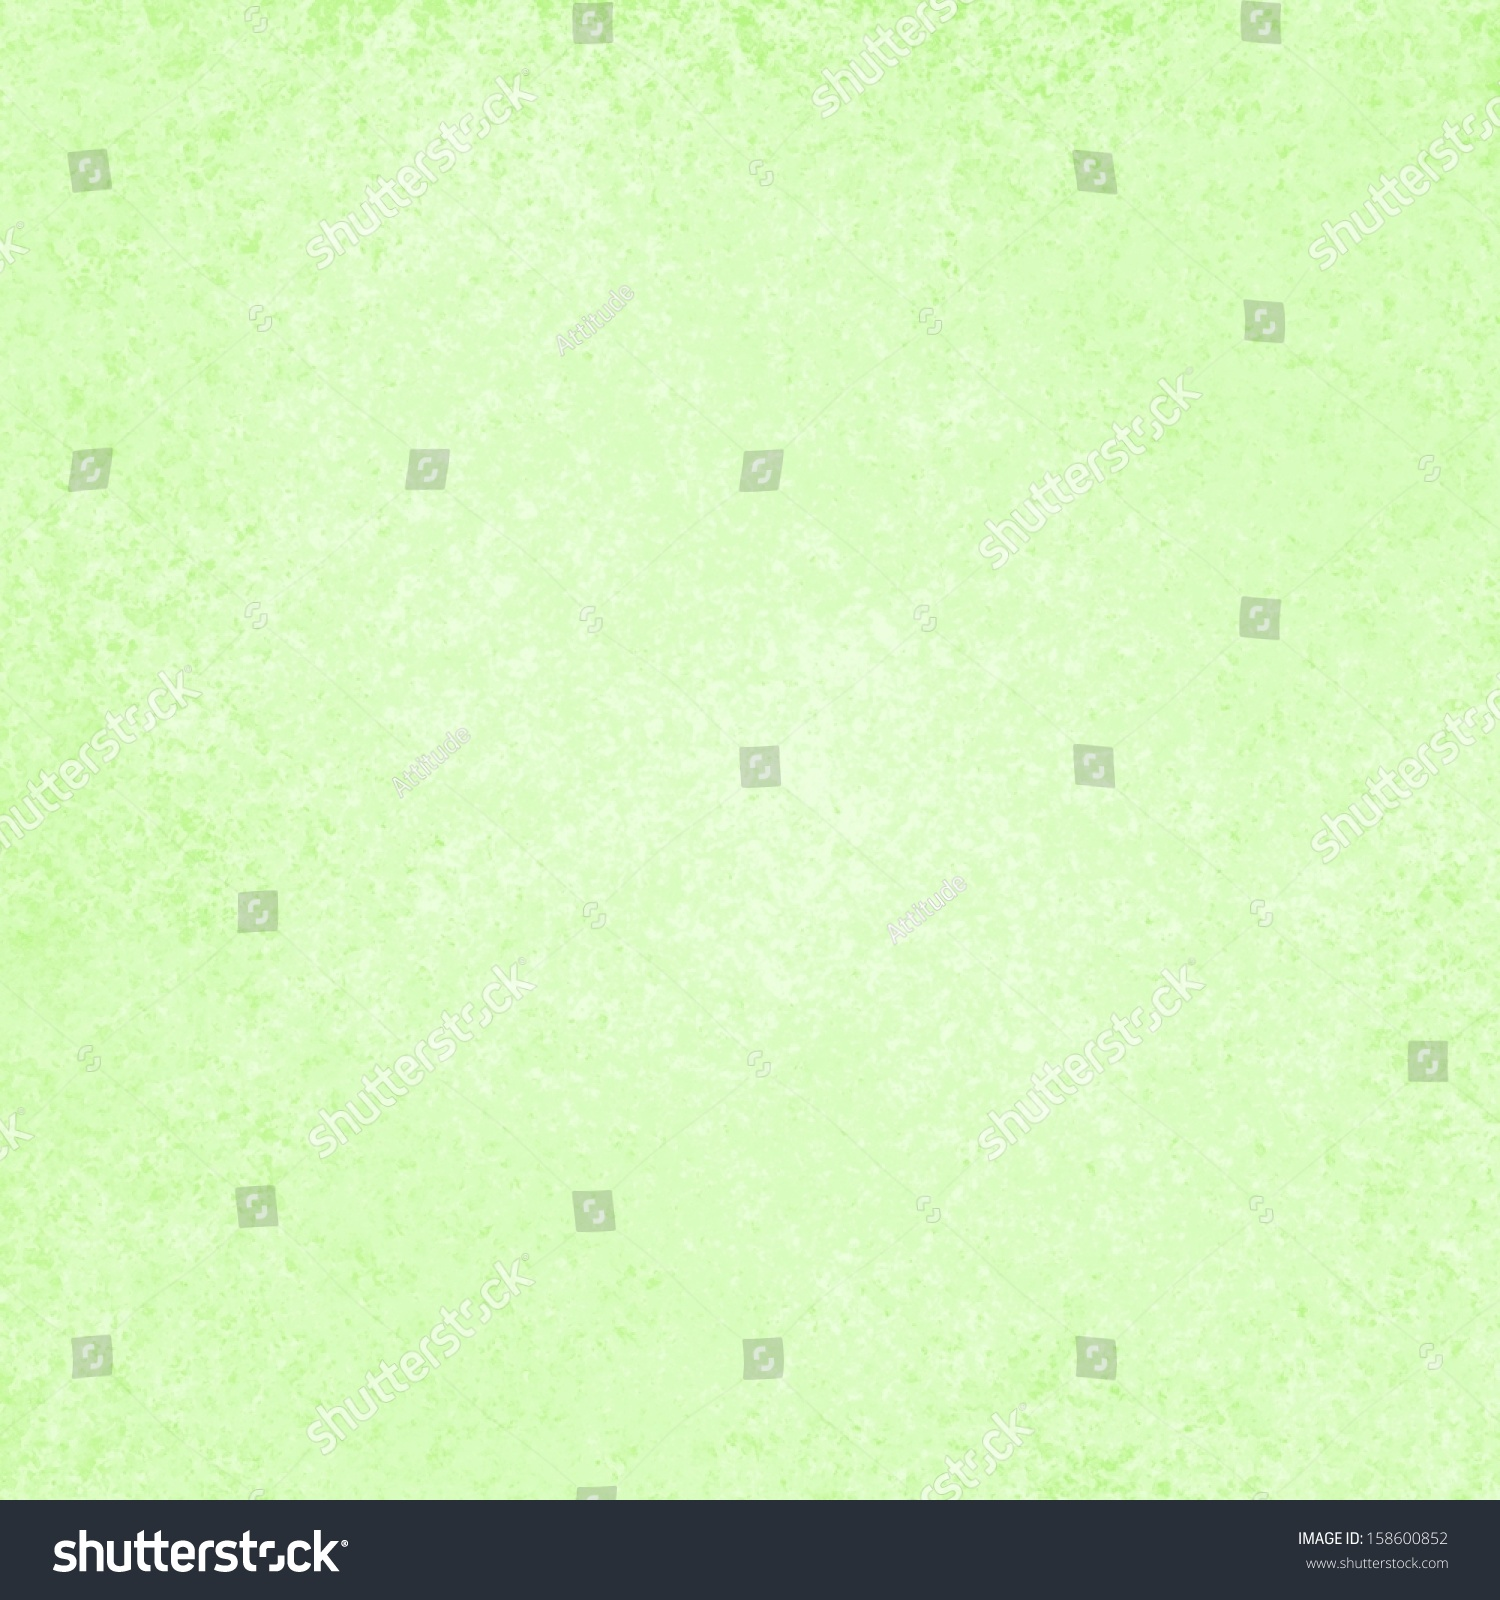 Light pastel green background textured paper stock Light pastel green paint